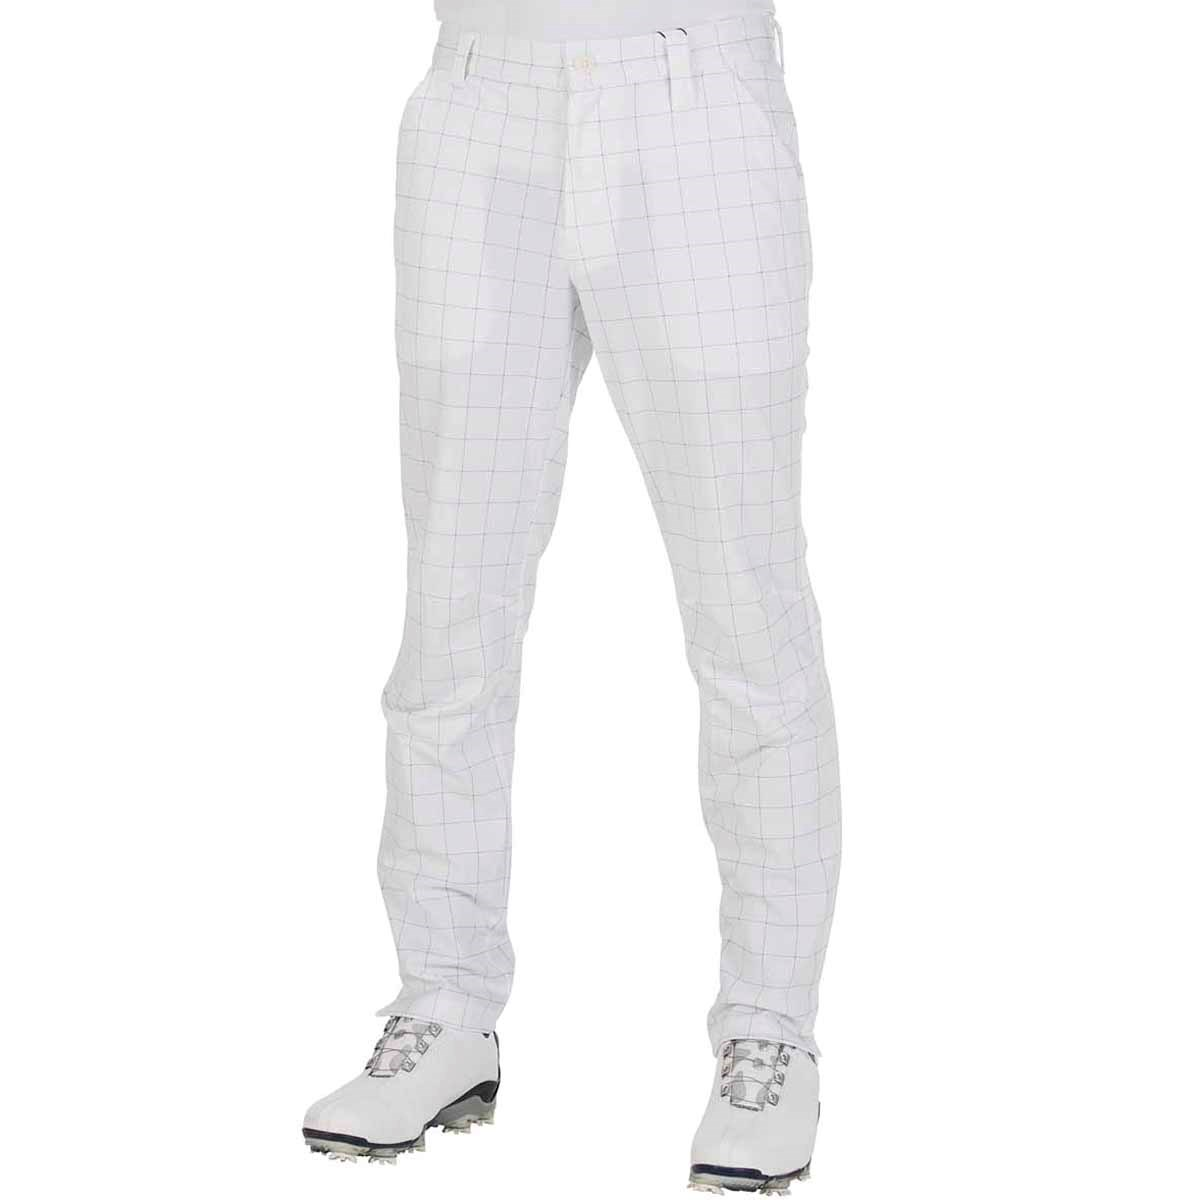 GDO オリジナル GDO ORIGINAL 6ポケットジャージゴルフパンツ 股下79cm 2:ウエスト目安78-80 ホワイトペン